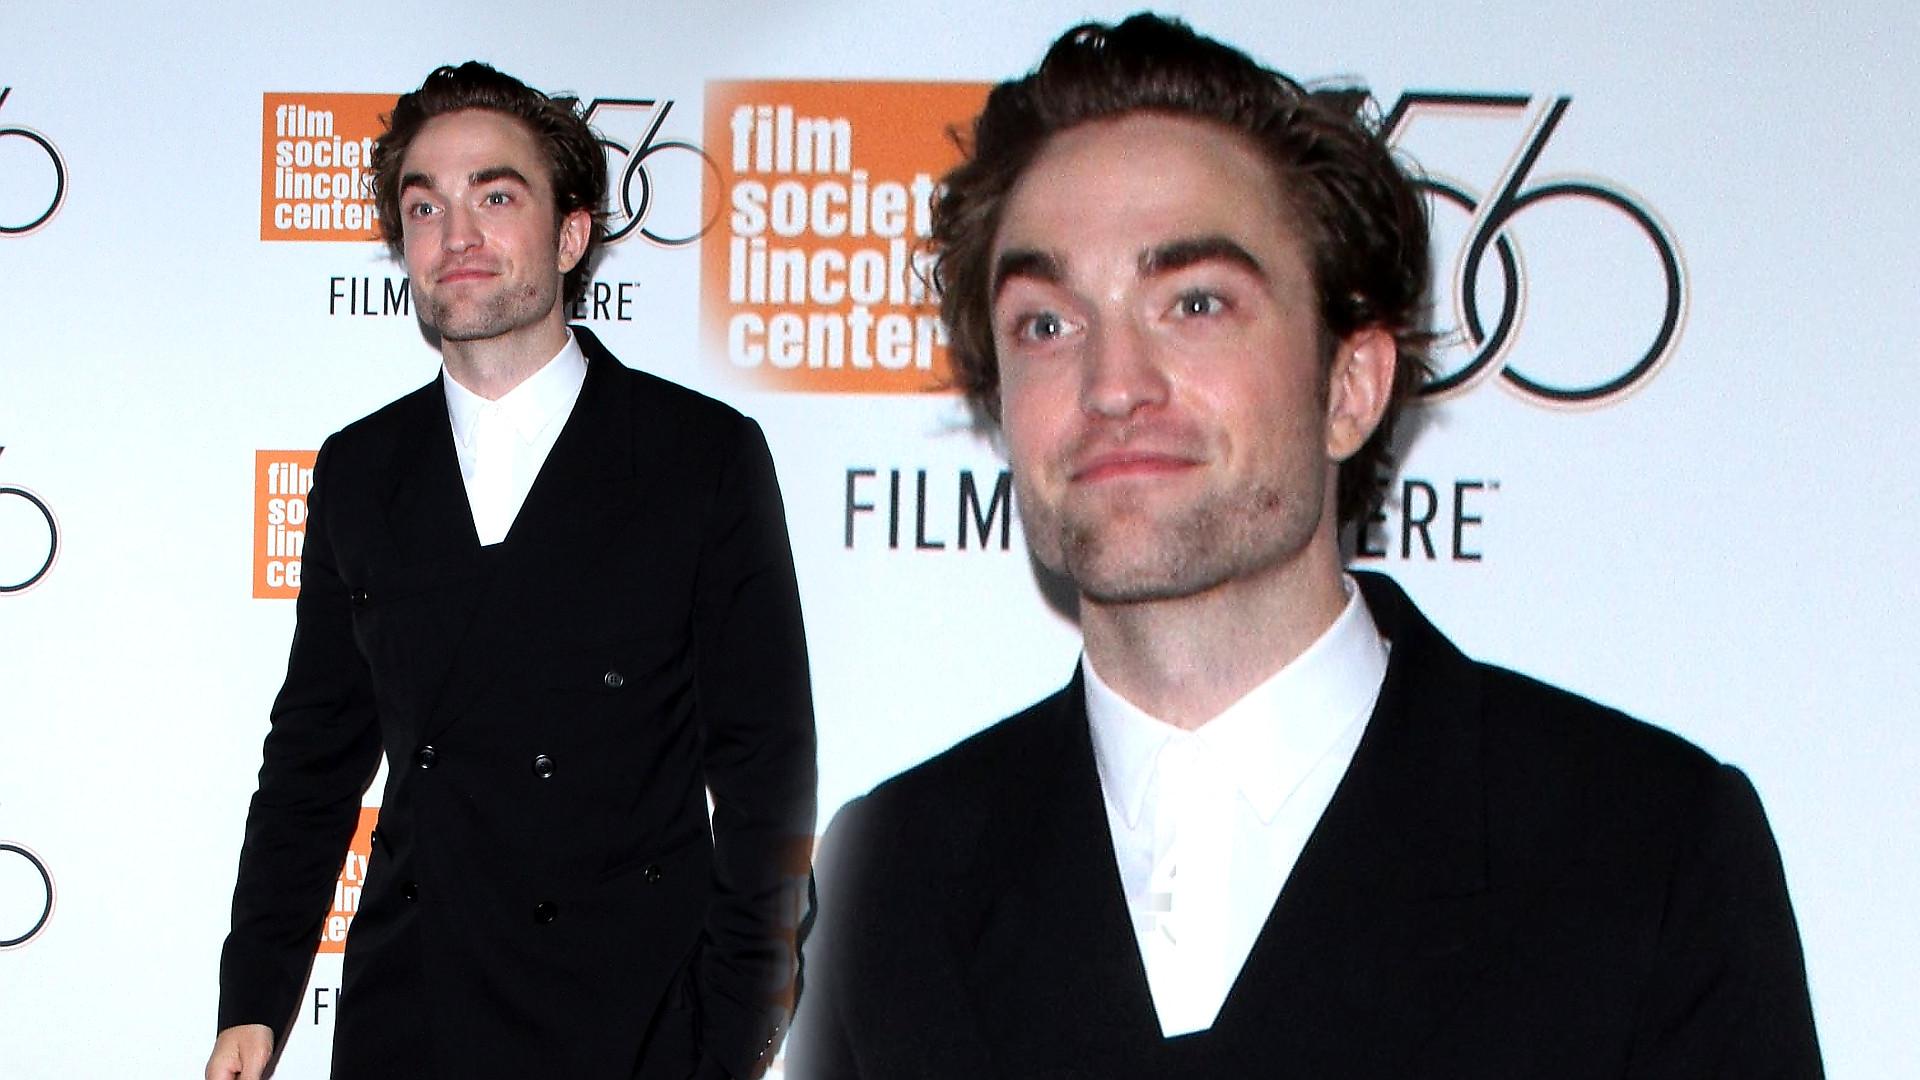 z kim Robert Pattinson spotyka się randki sebastopol ca